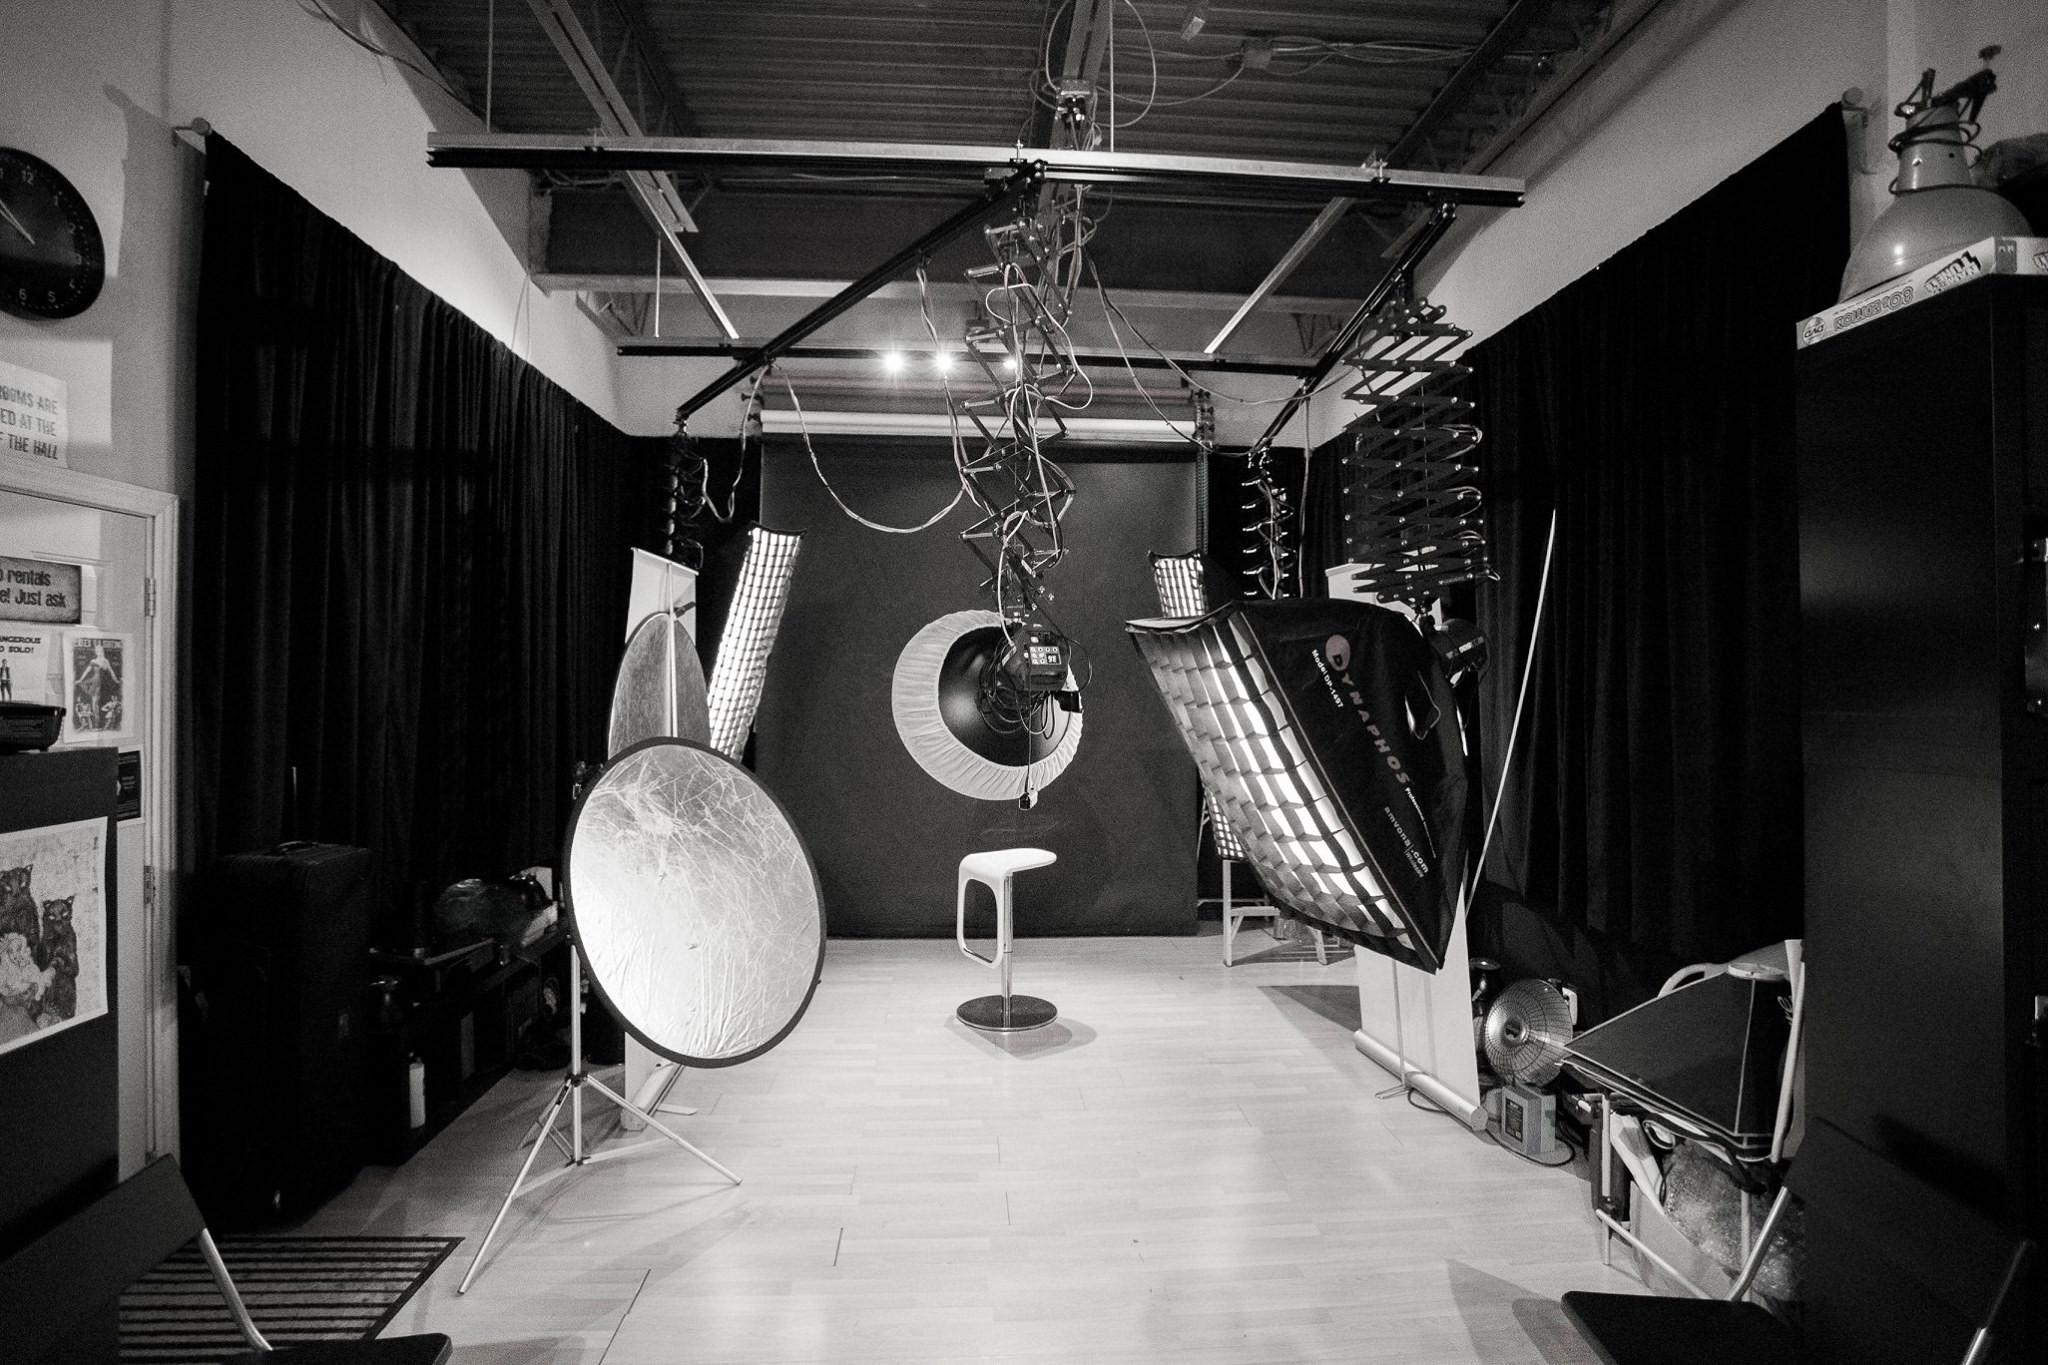 1 hour Studio w/ tech included